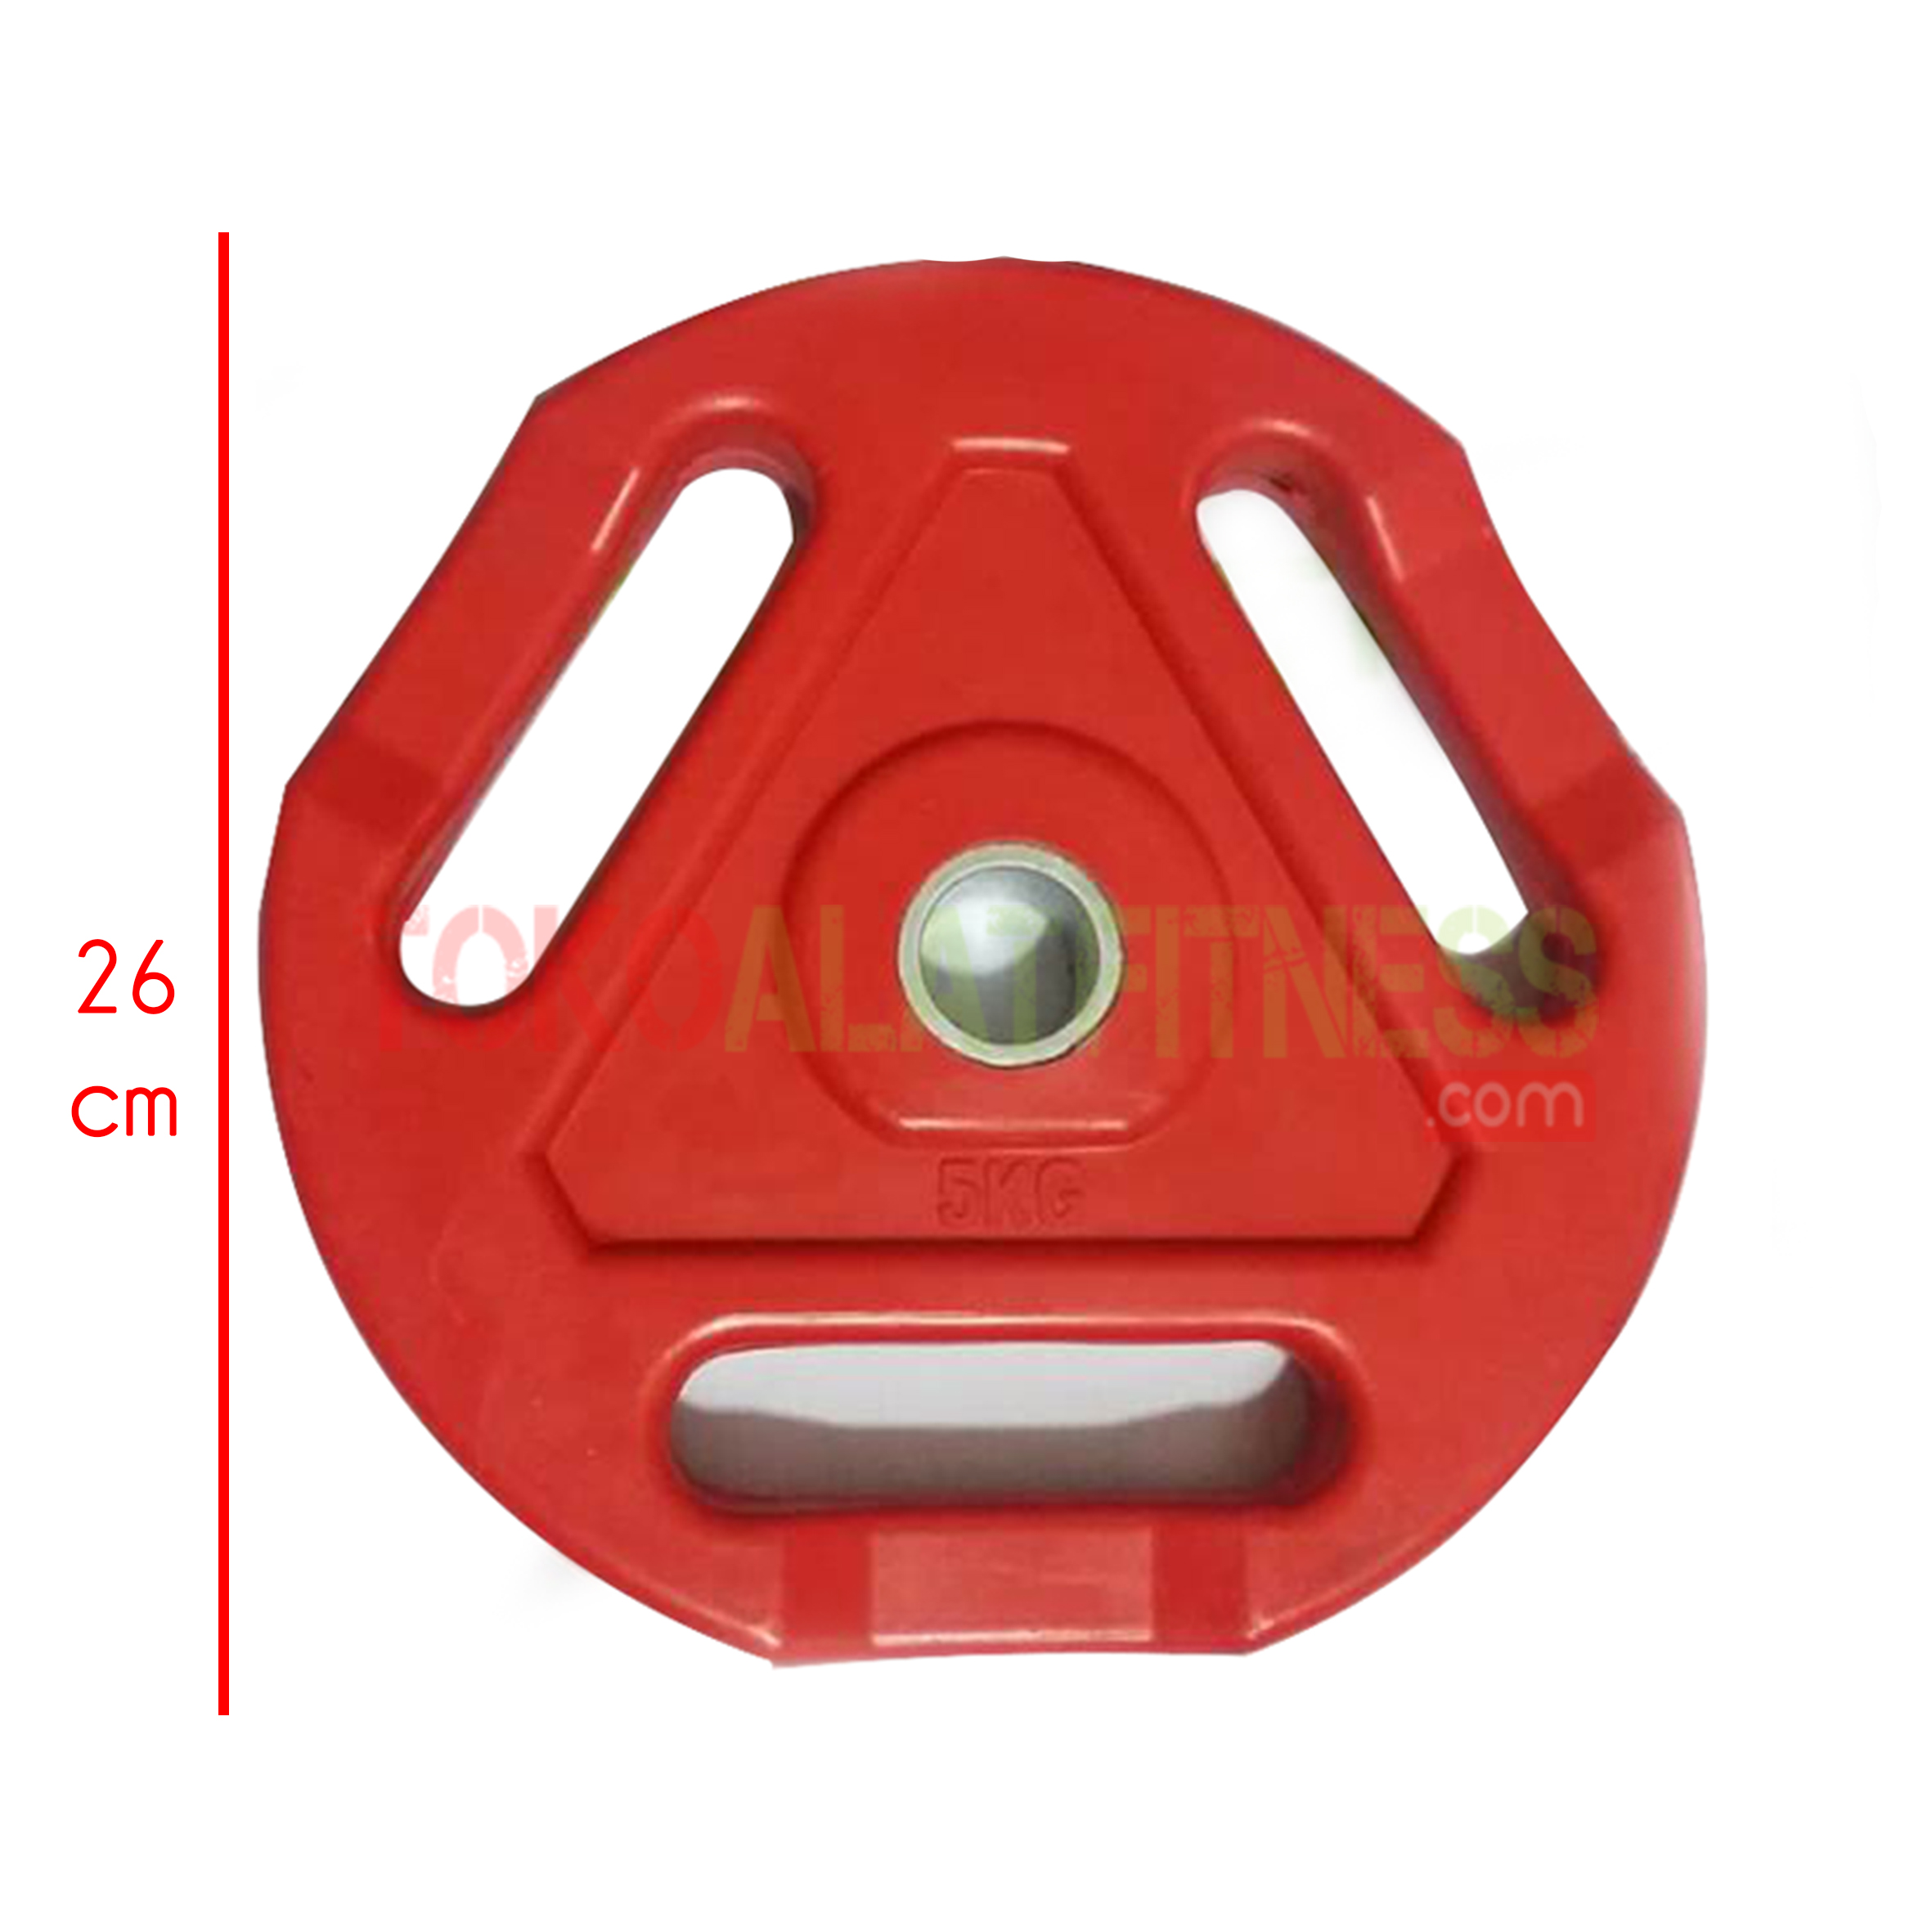 spek Plate Rubber 5 kg wtm - Rubber Plate Grip Warna 3cm Merah 5kg Body Gym